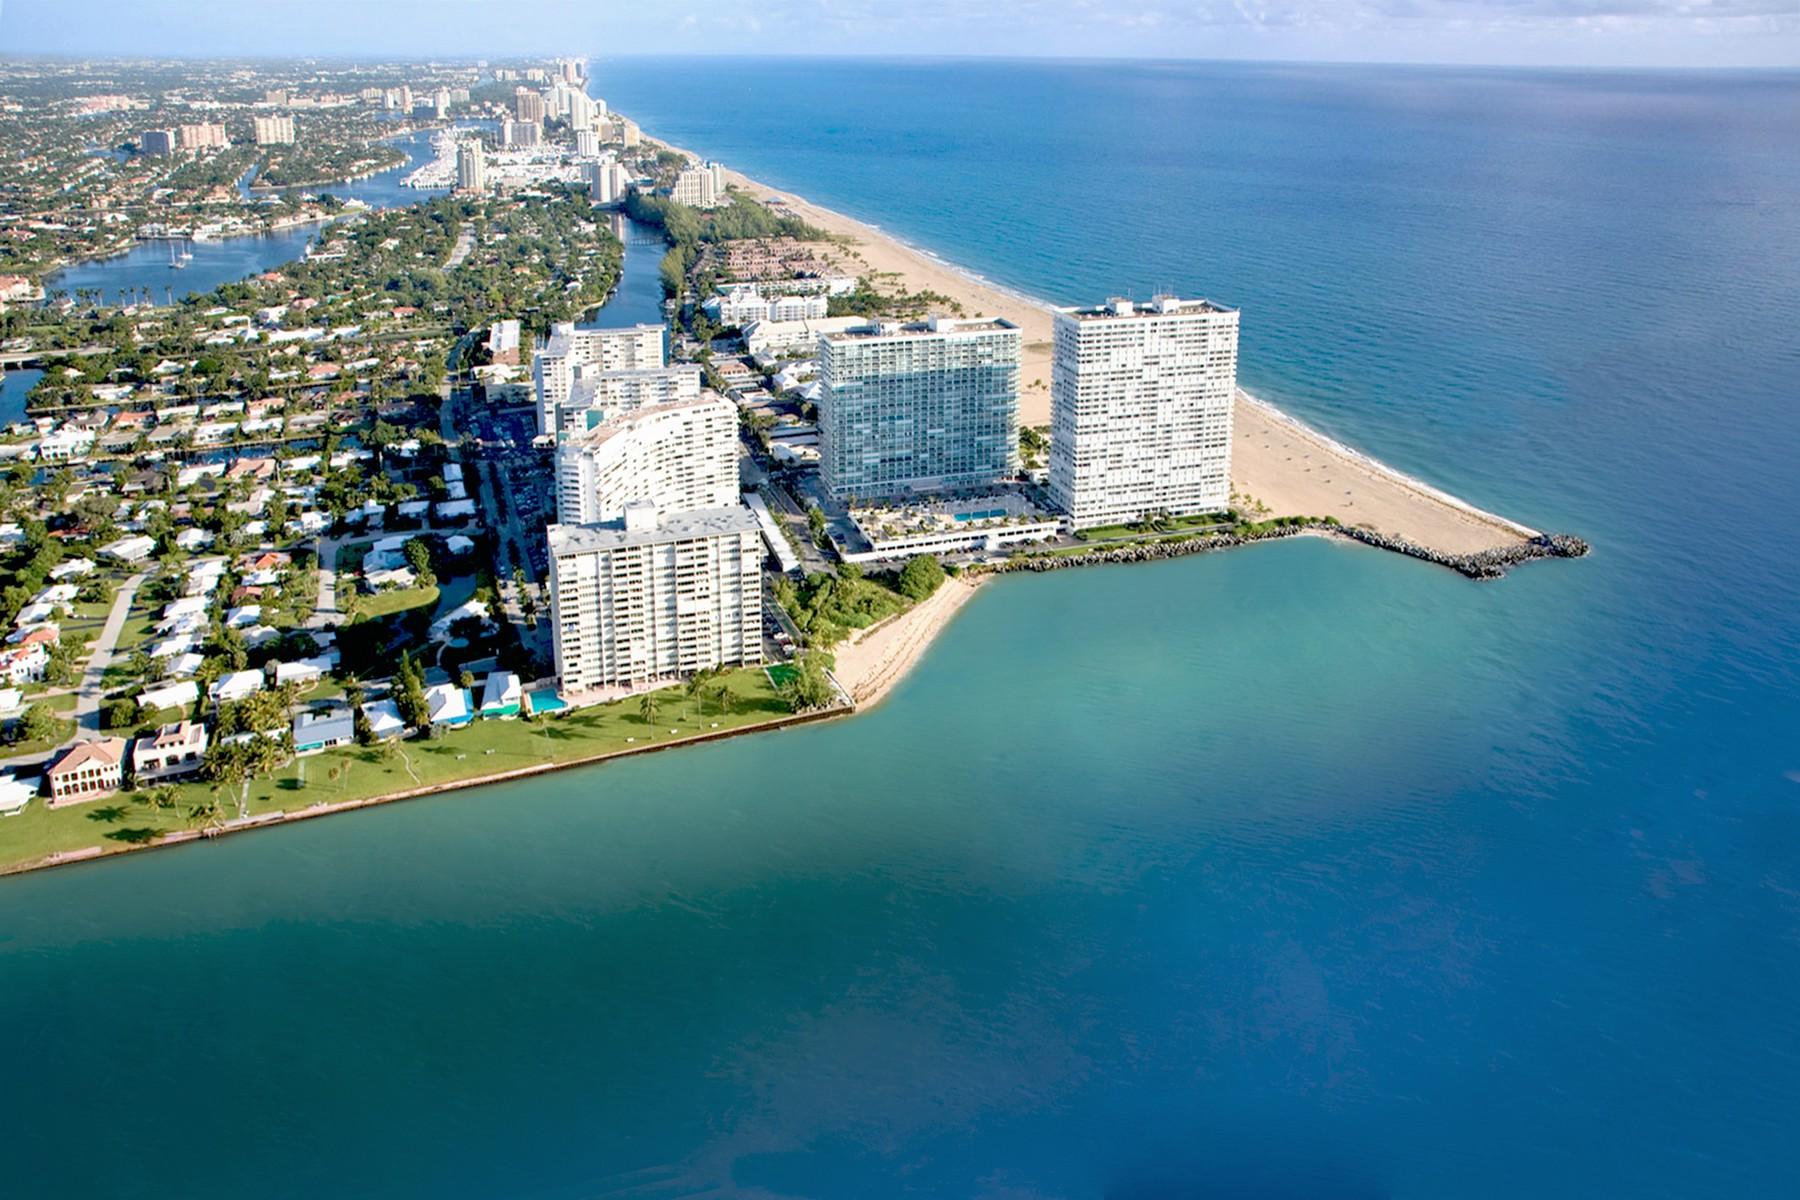 Property For Sale at 2200 S. Ocean Lane Unit# 2803